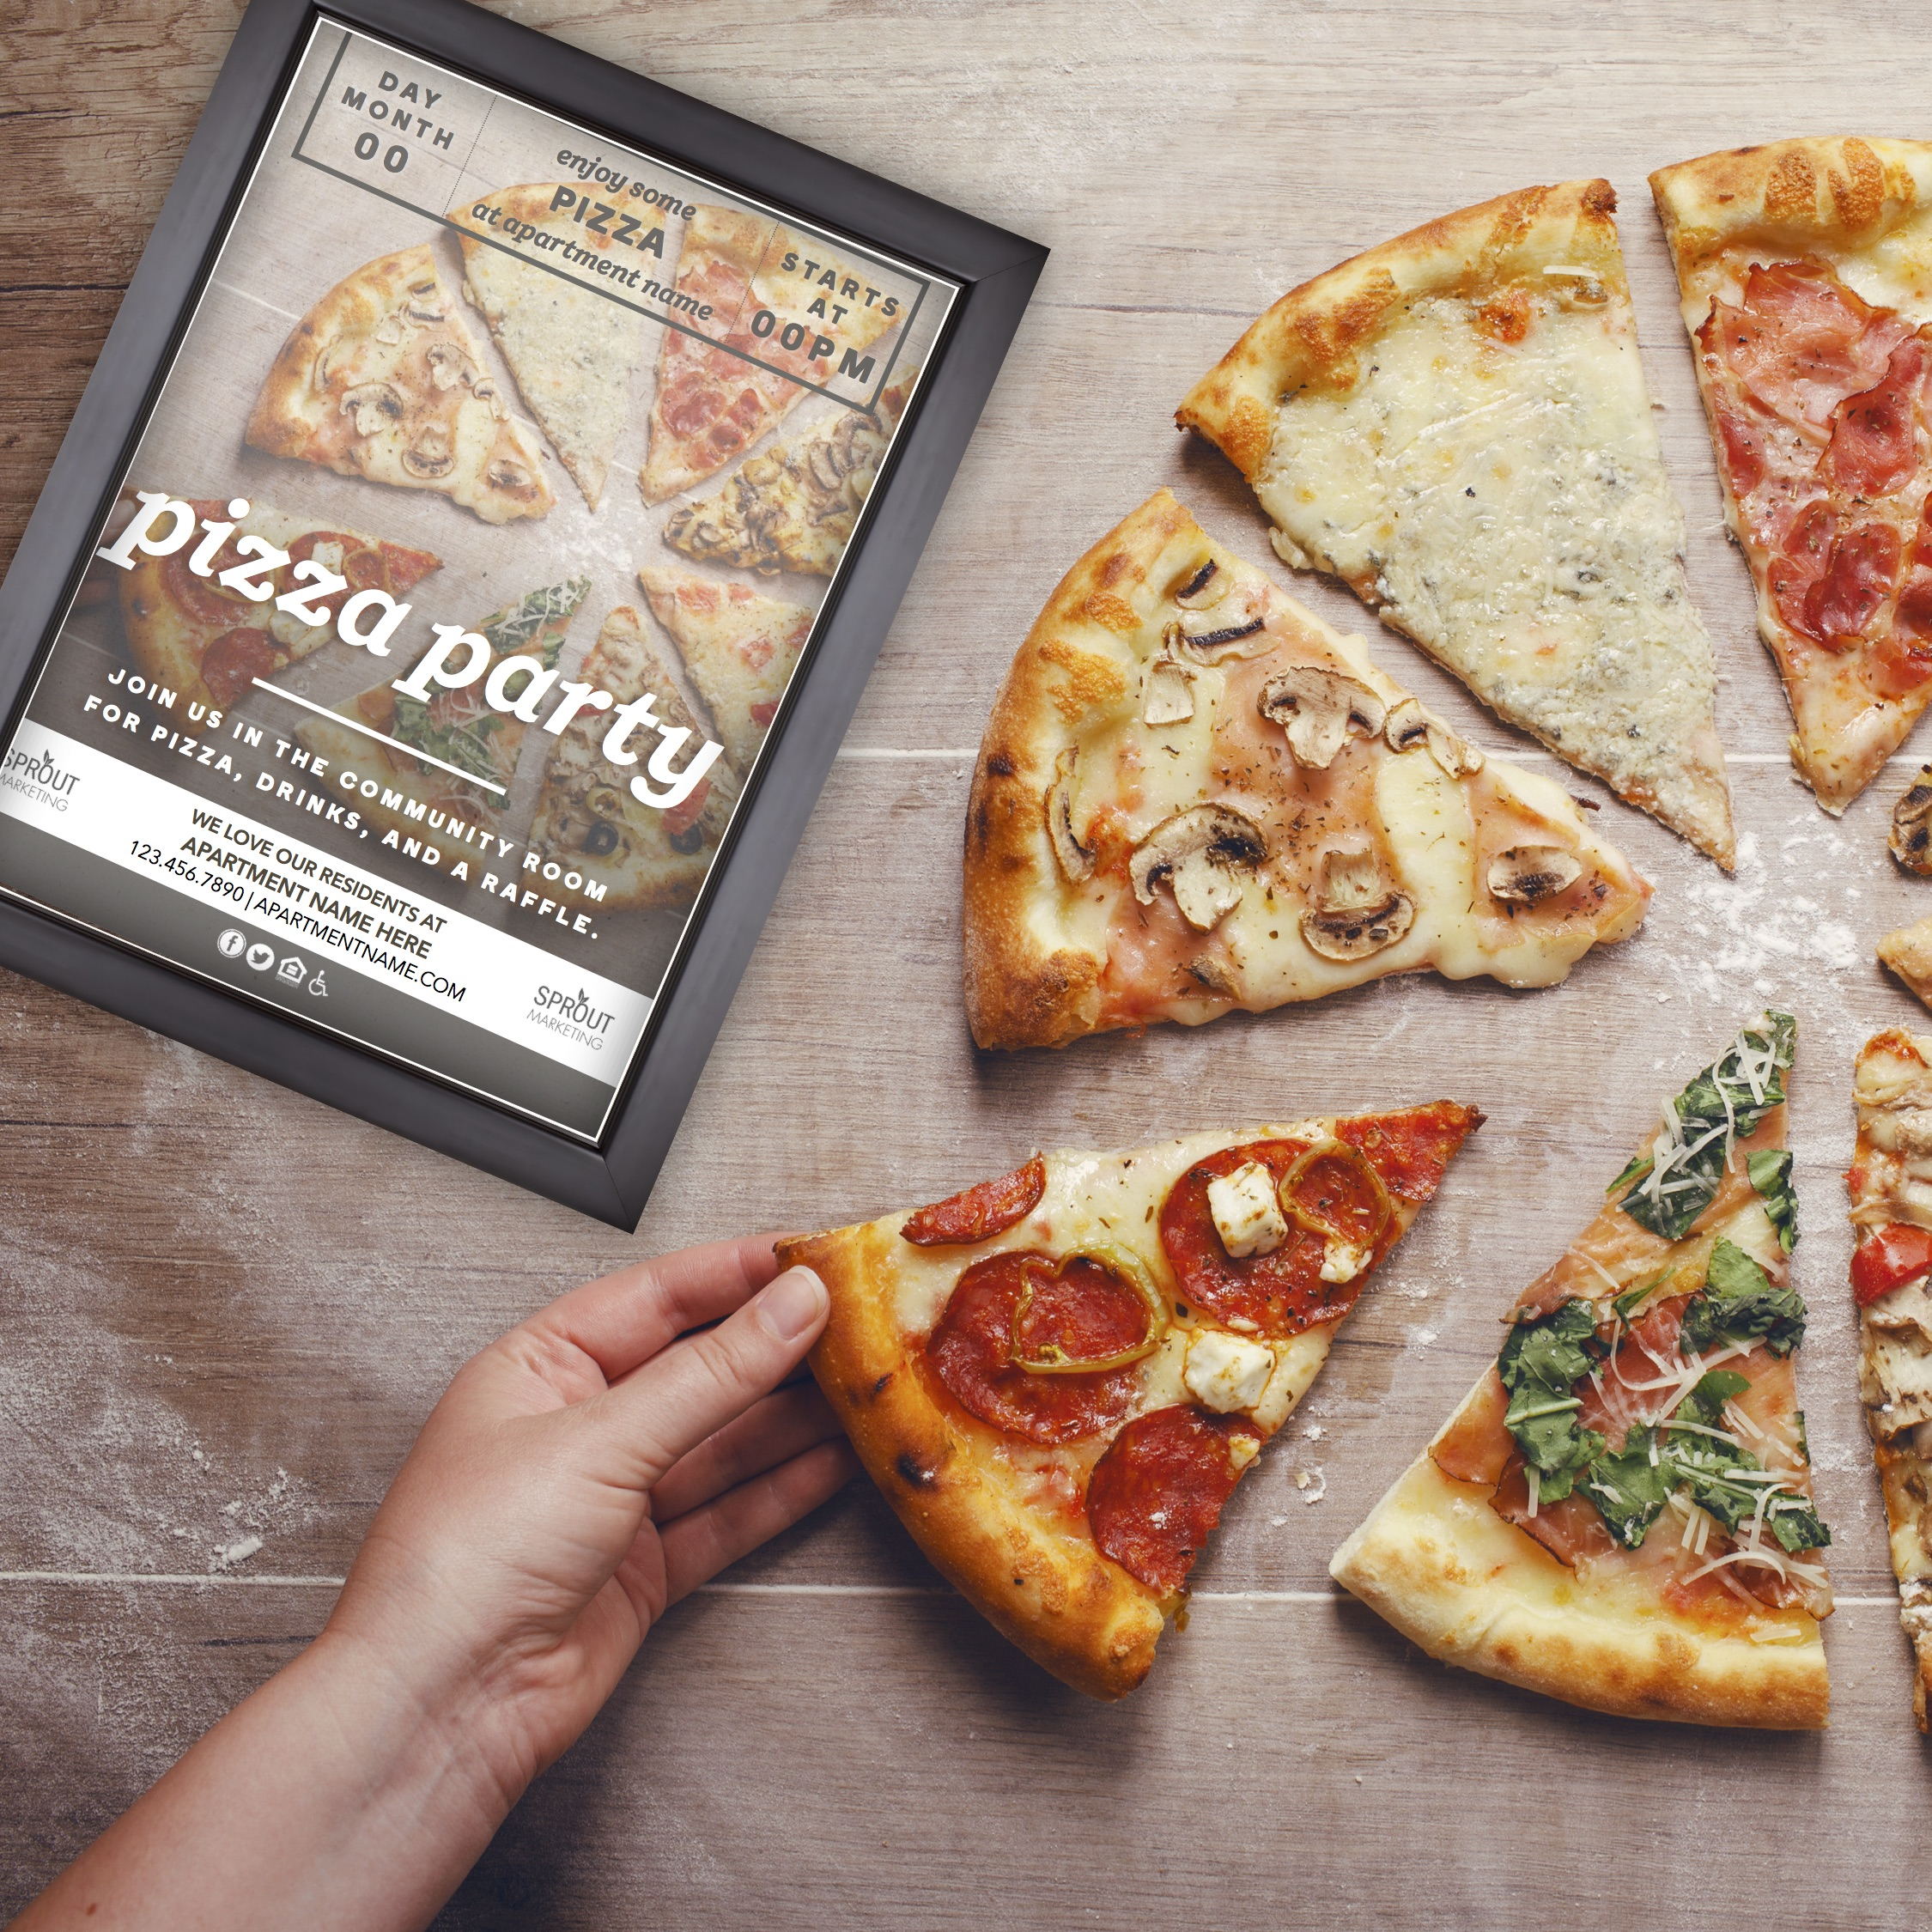 MU51_jlb_pizza_23312 pizza_mock.jpg